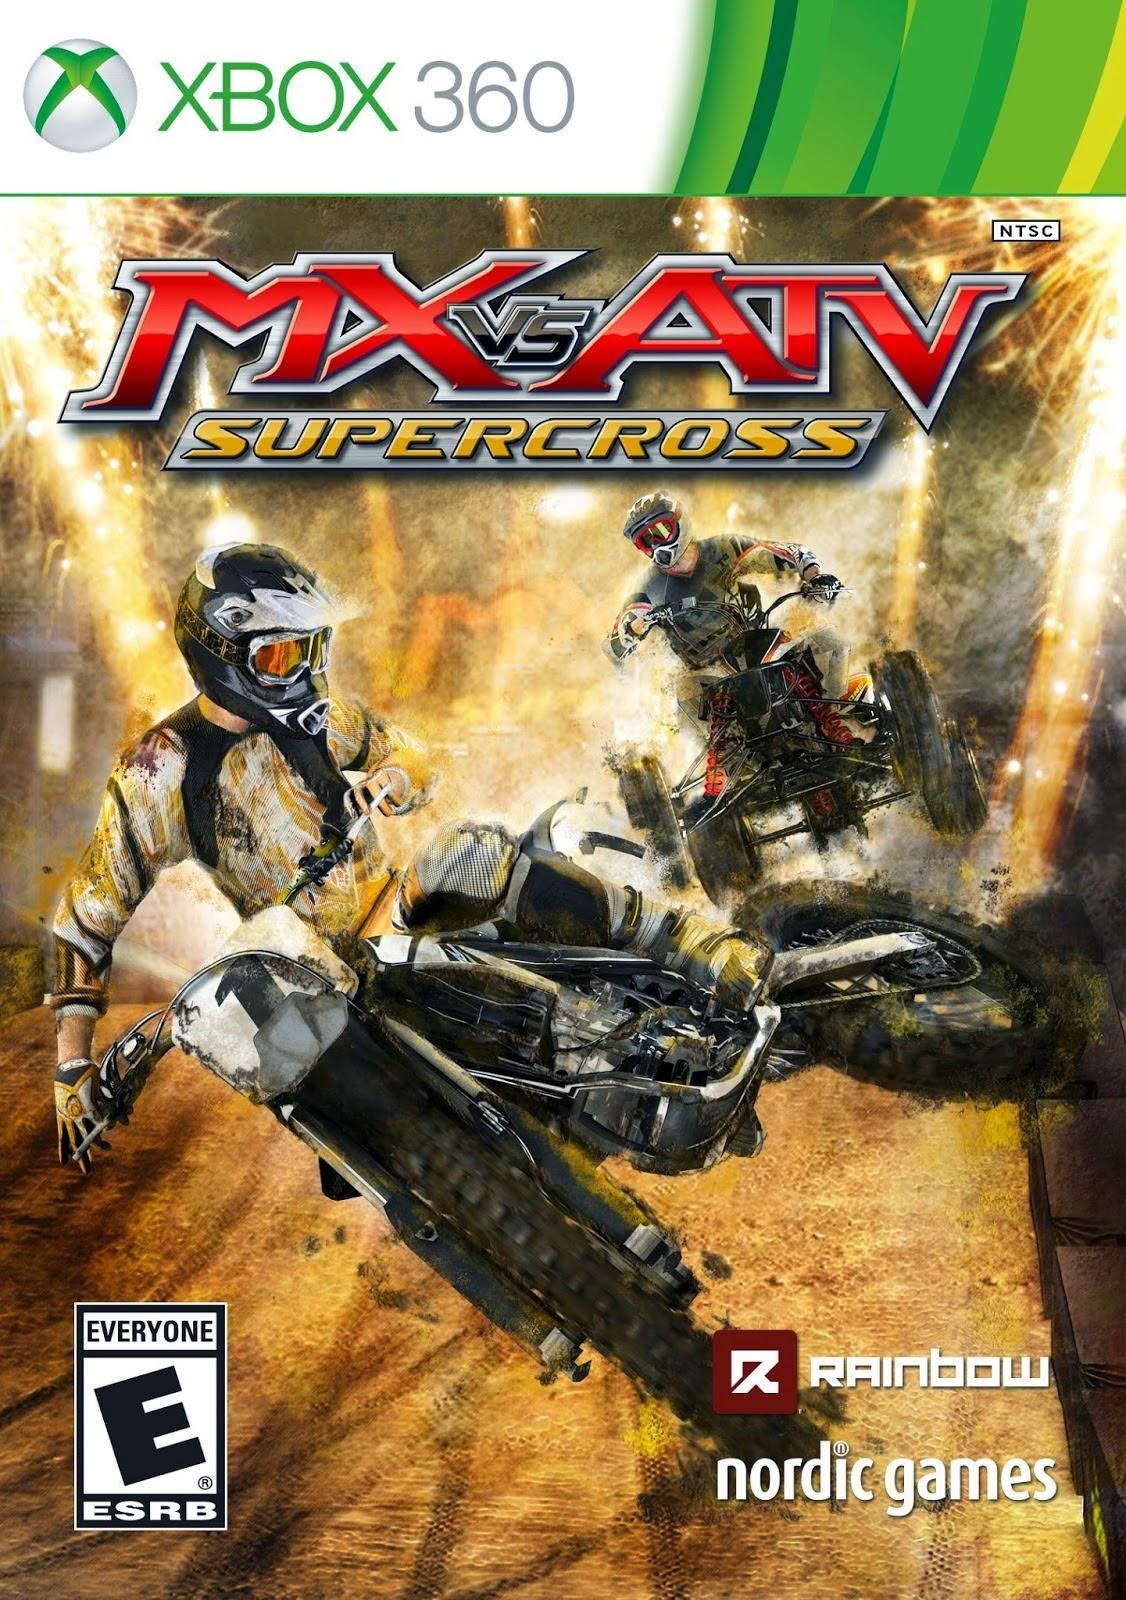 MX vs ATV Supercross Xbox360 free download full version